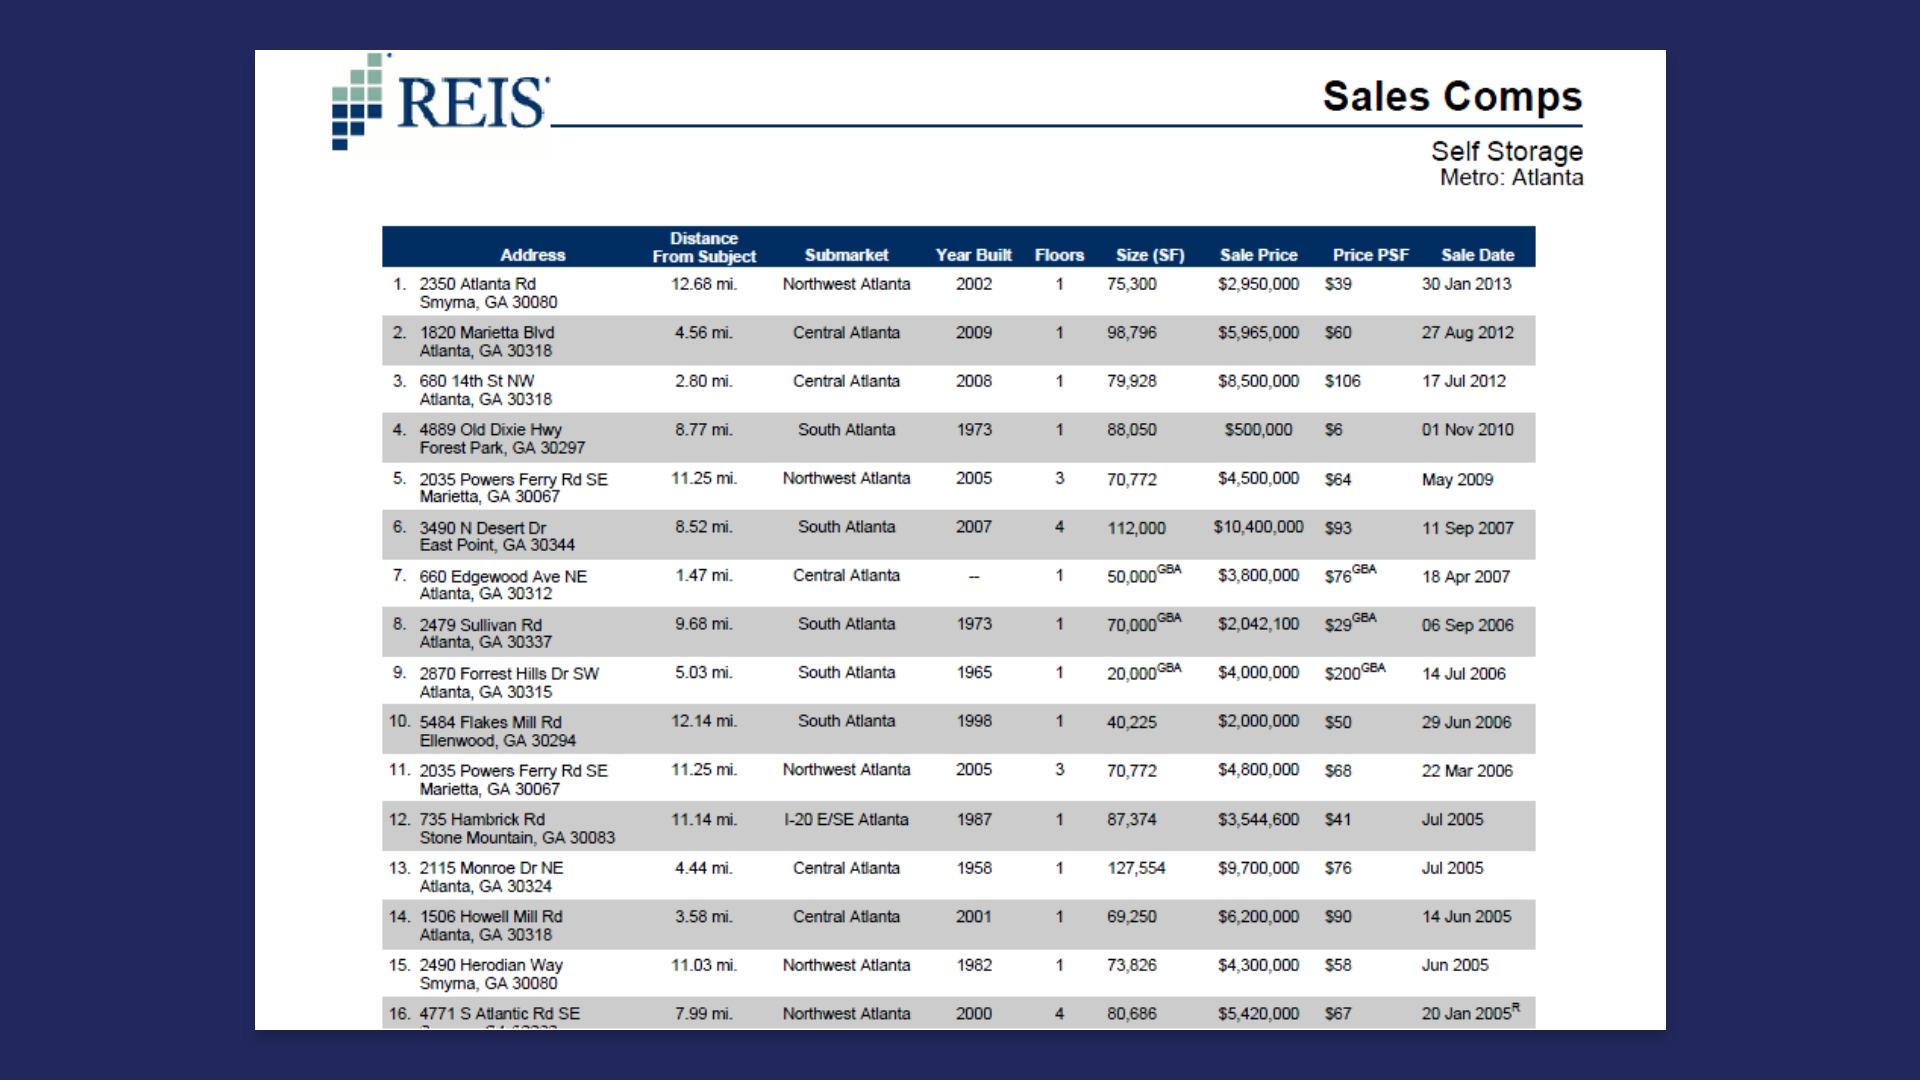 Commercial Real Estate Sales Comp Sample